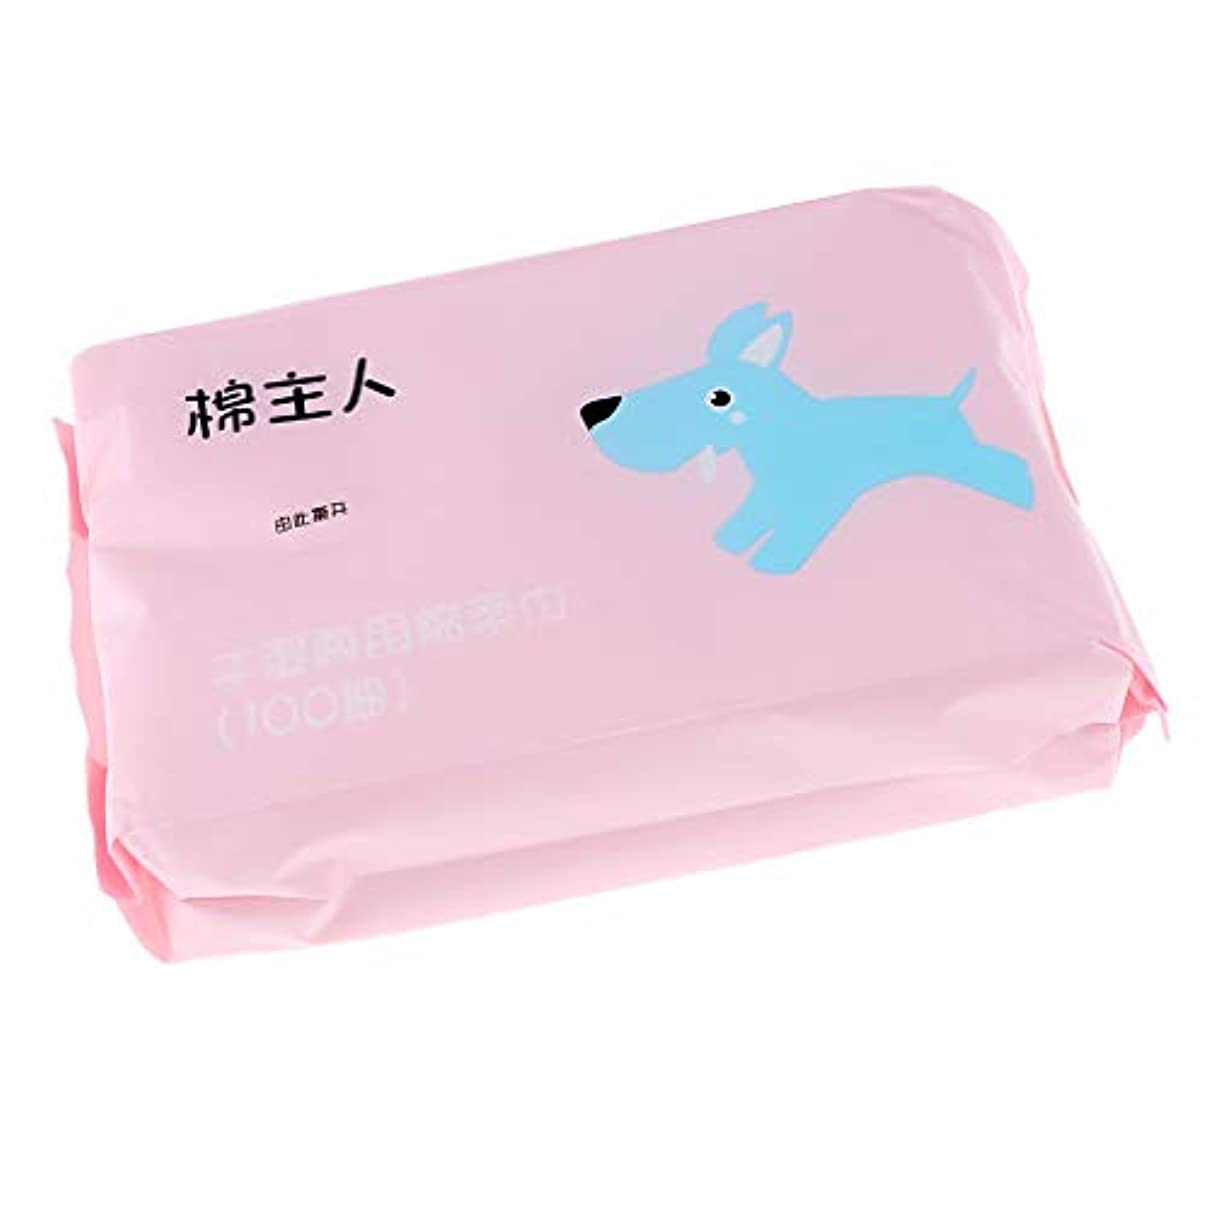 T TOOYFUL 約100枚 使い捨 クレンジングシート クリーニング フェイス タオル ソフト 敏感肌適用 全2色 - ピンク